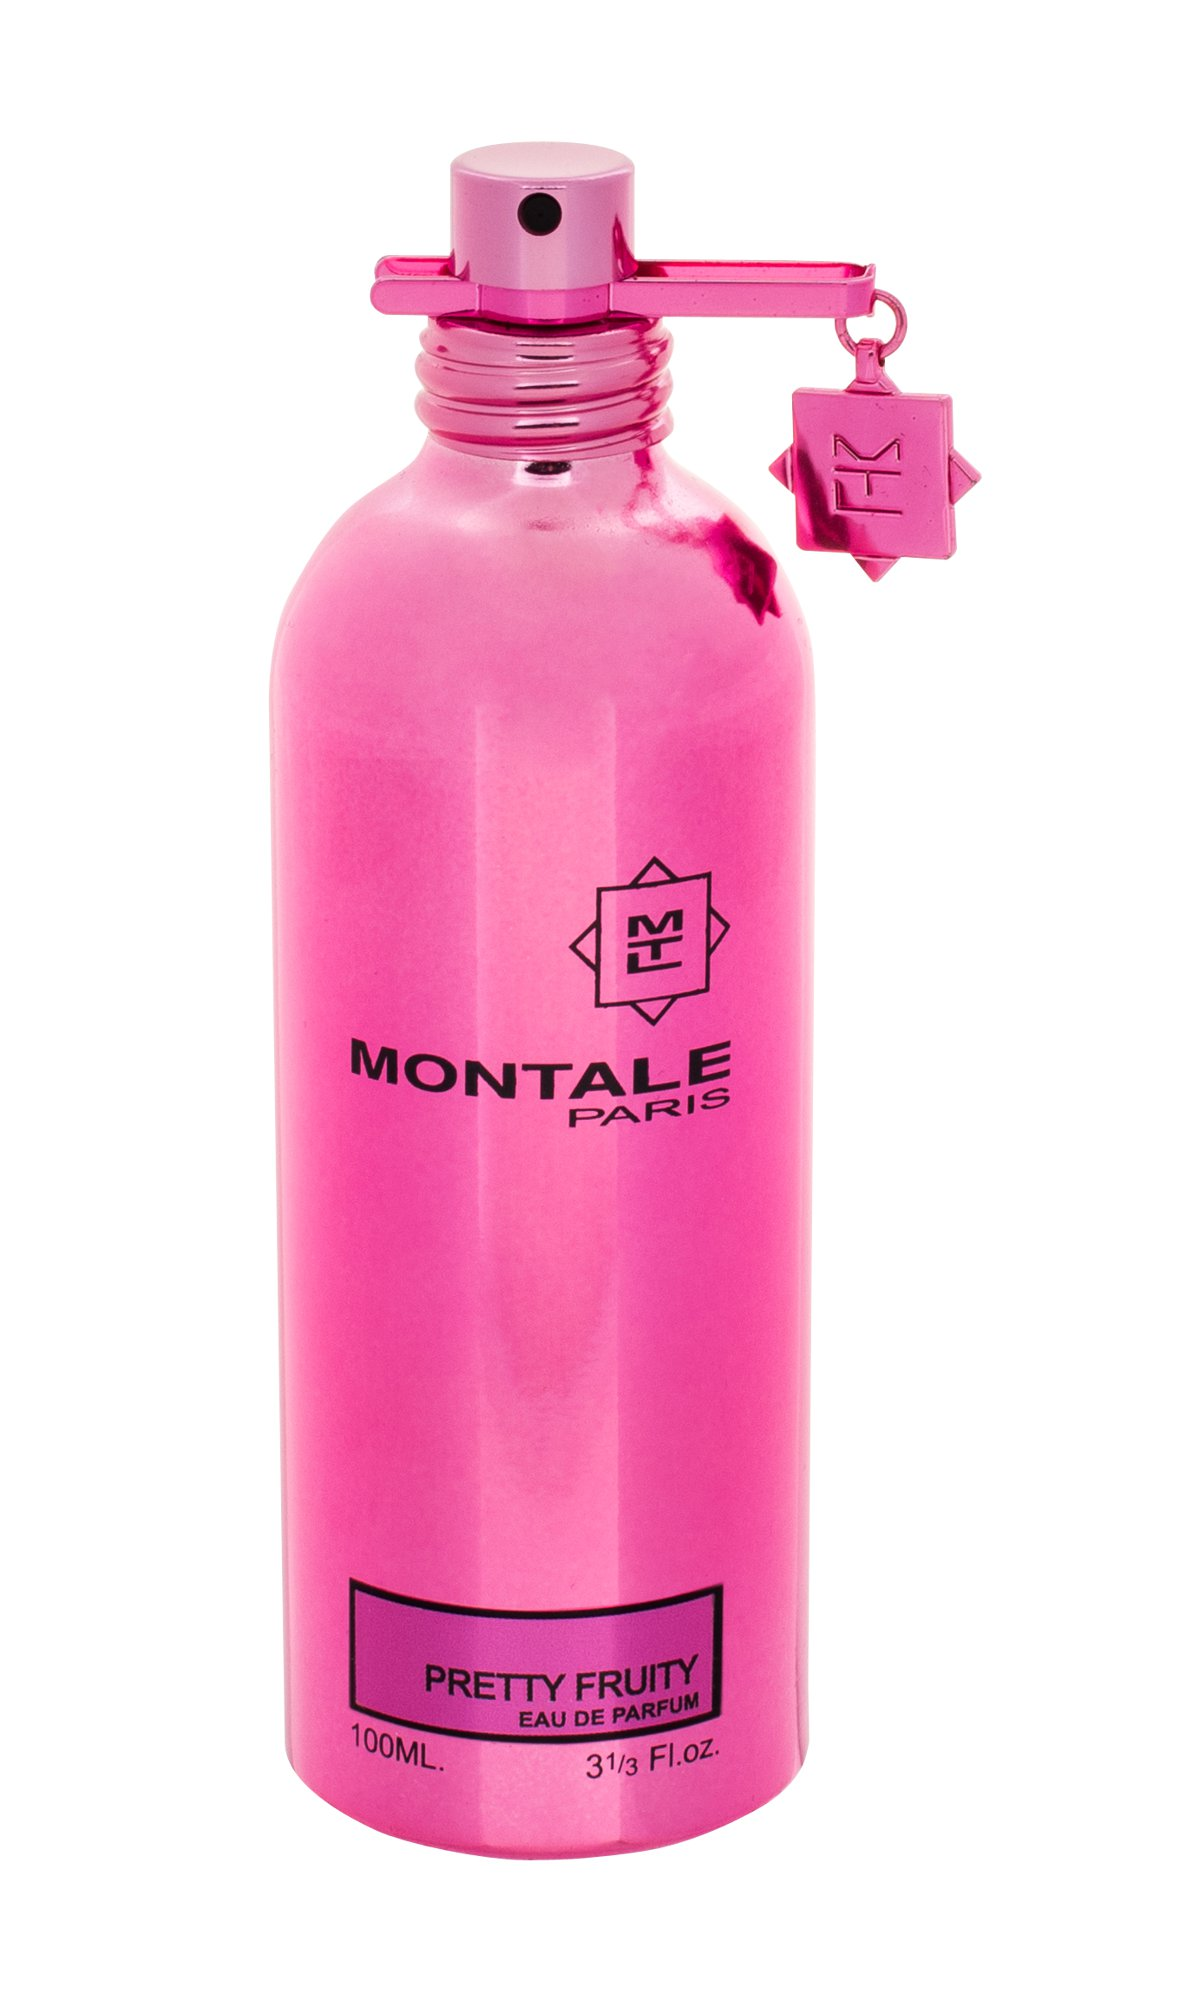 Montale Paris Pretty Fruity, edp 100ml